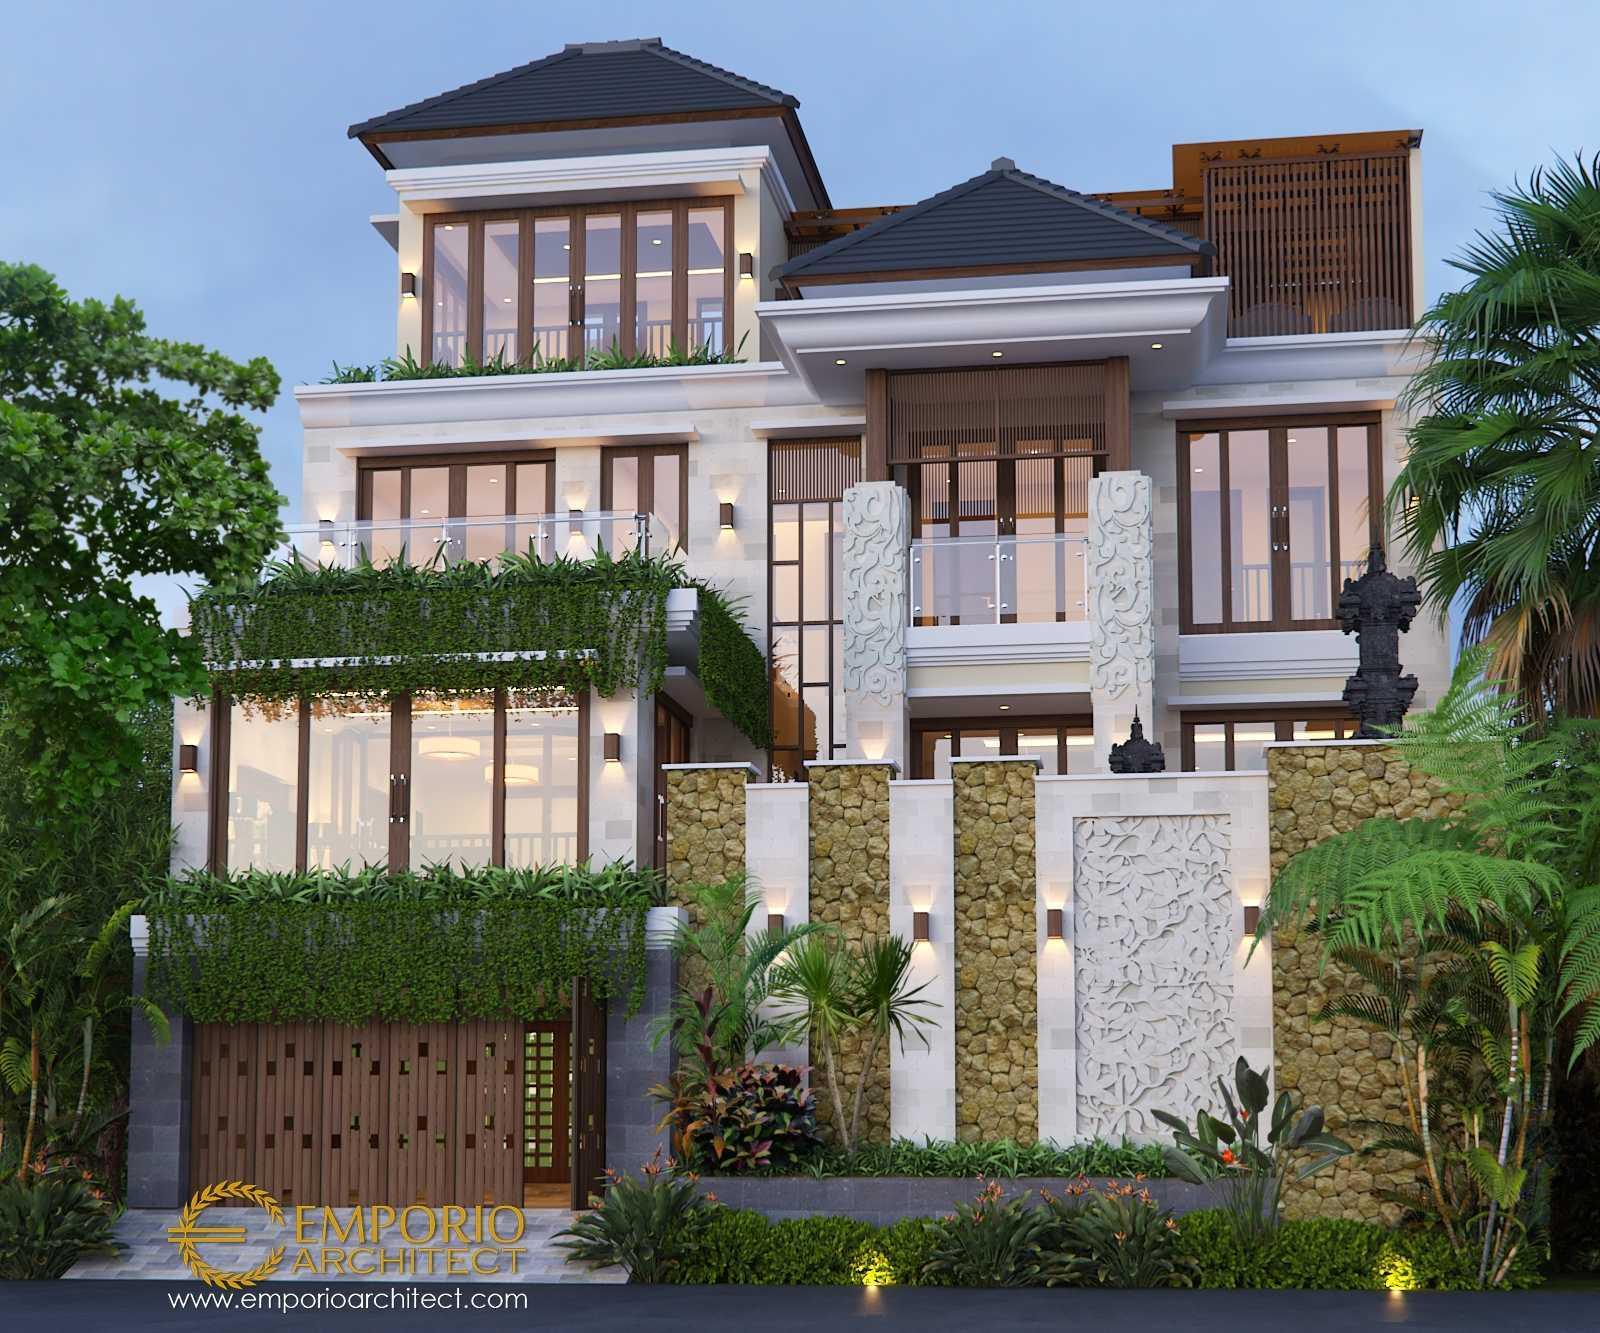 Emporio Architect Desain Rumah Villa Bali Tropis 494 @ Denpasar, Bali Kota Denpasar, Bali, Indonesia Kota Denpasar, Bali, Indonesia Emporio-Architect-Desain-Rumah-Villa-Bali-Tropis-494-Denpasar-Bali Tropical 78280